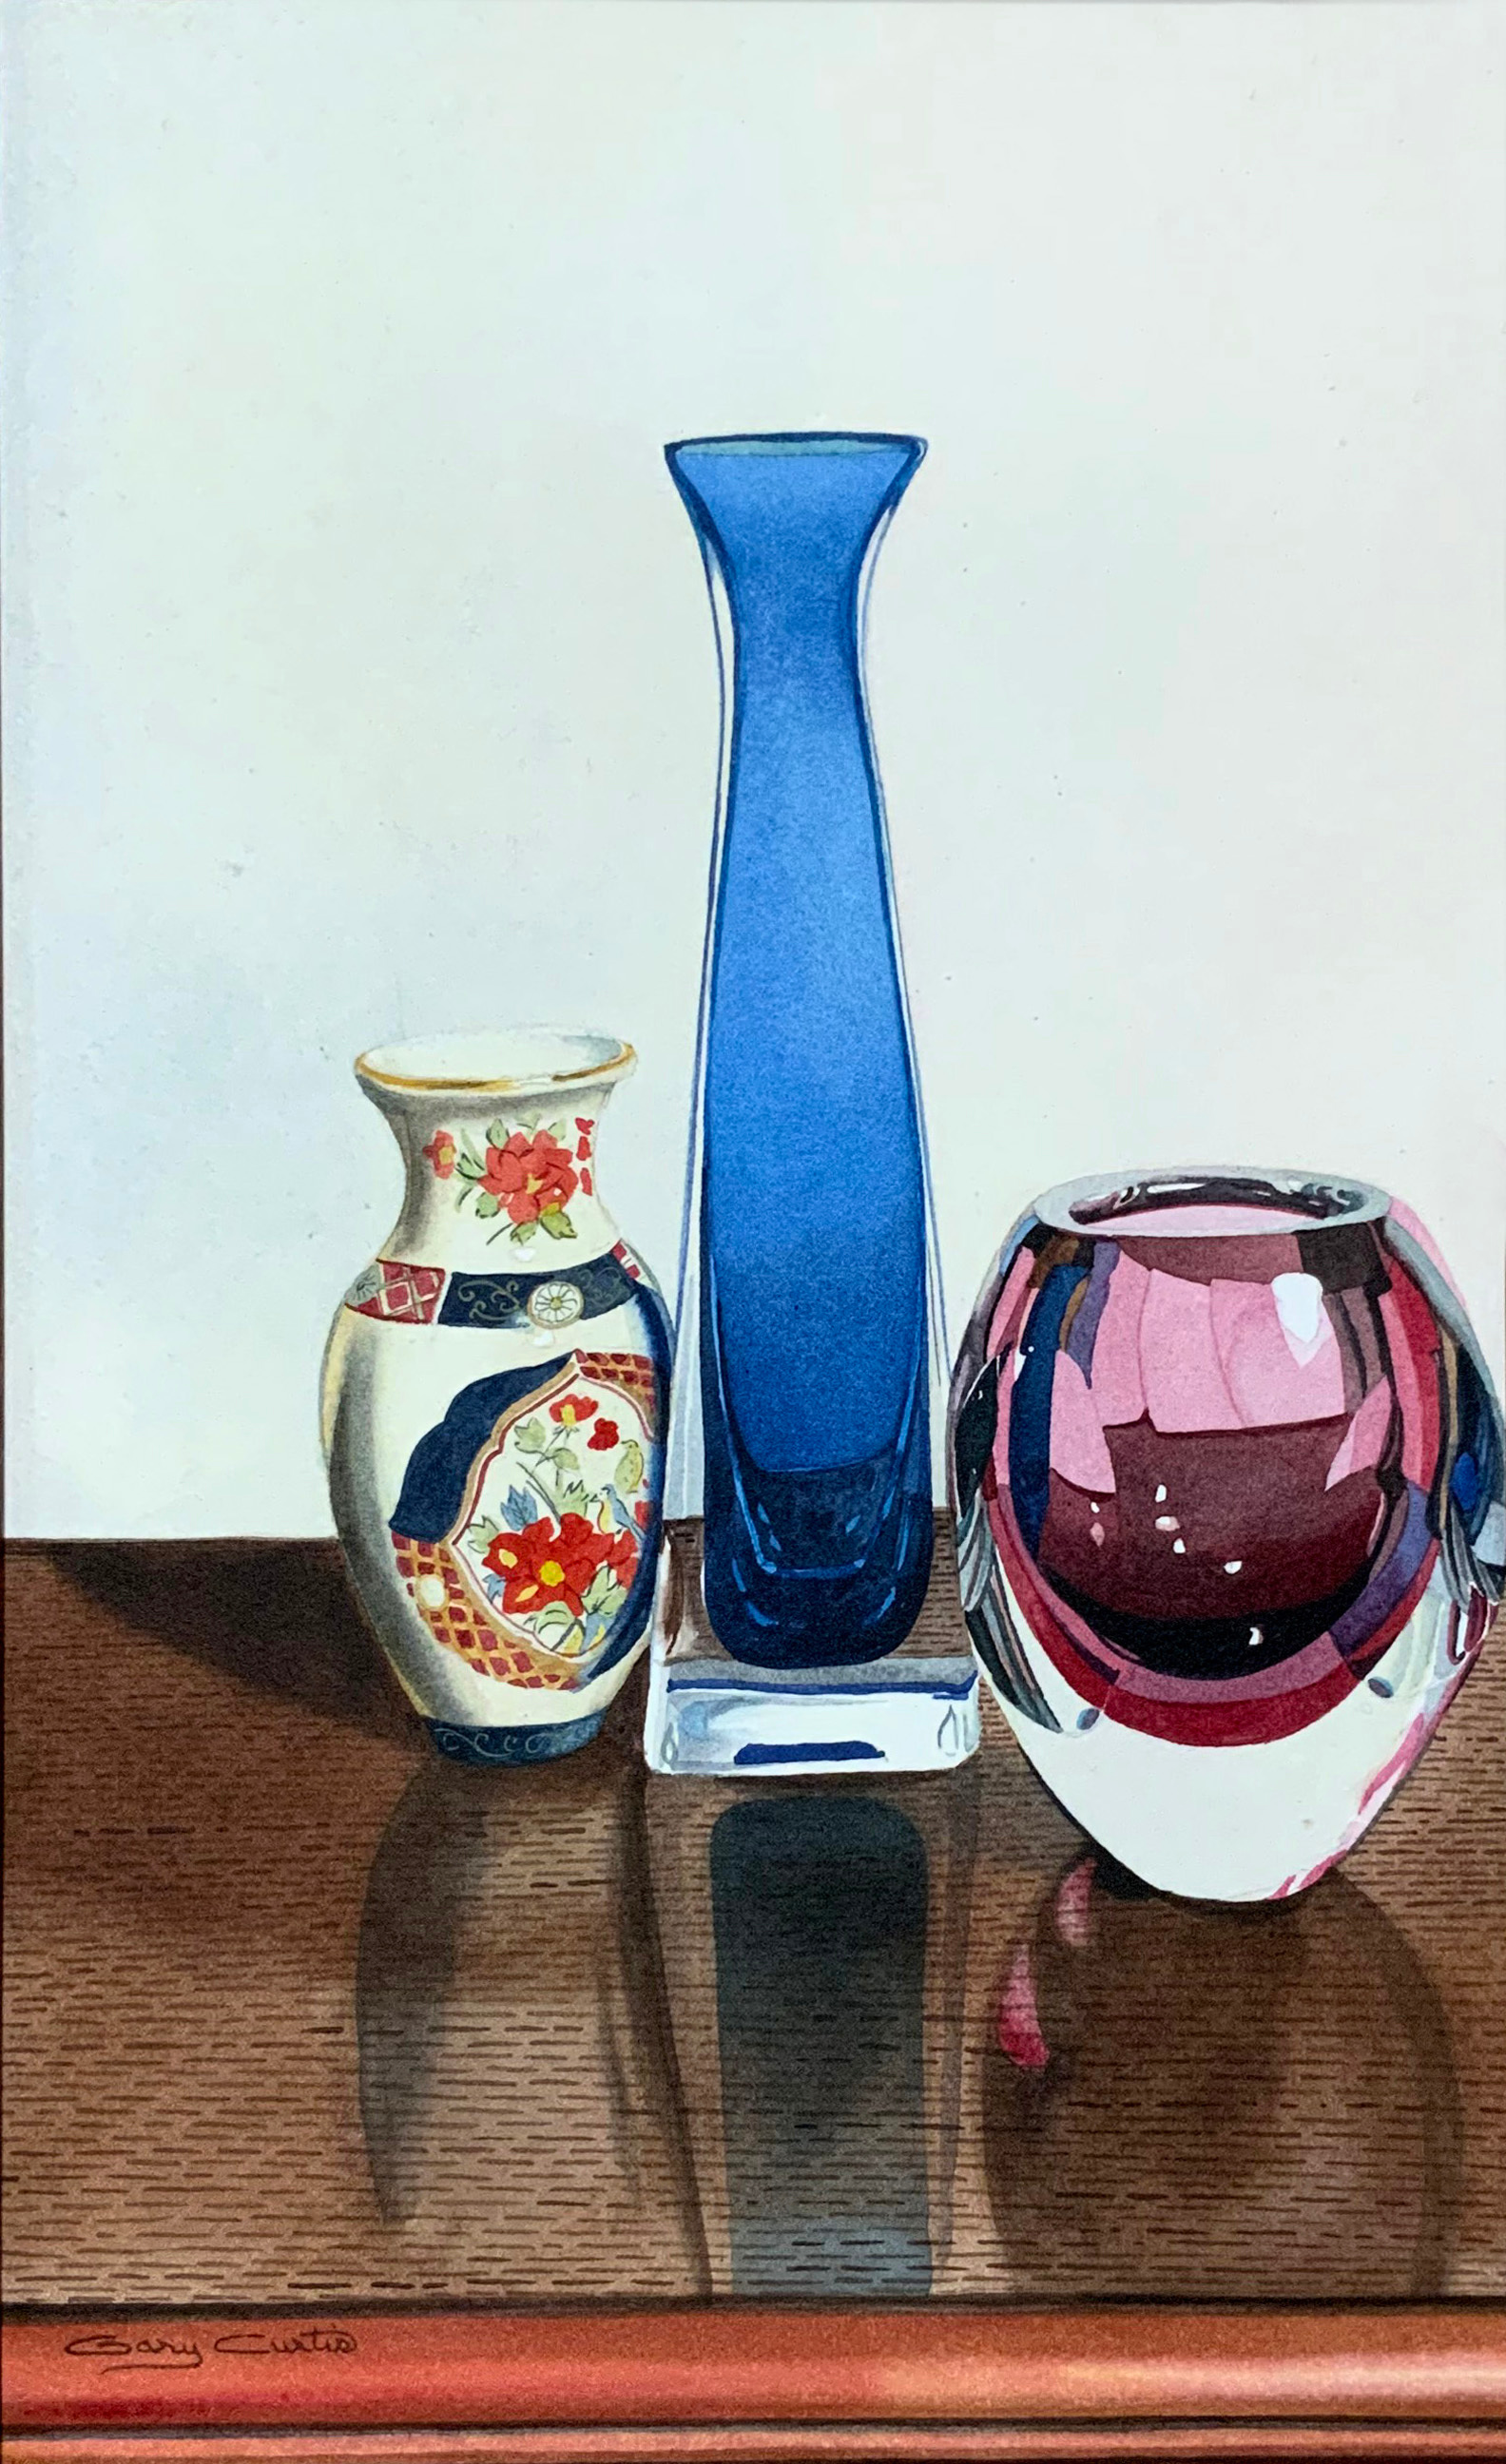 Thre3 vases coiefj